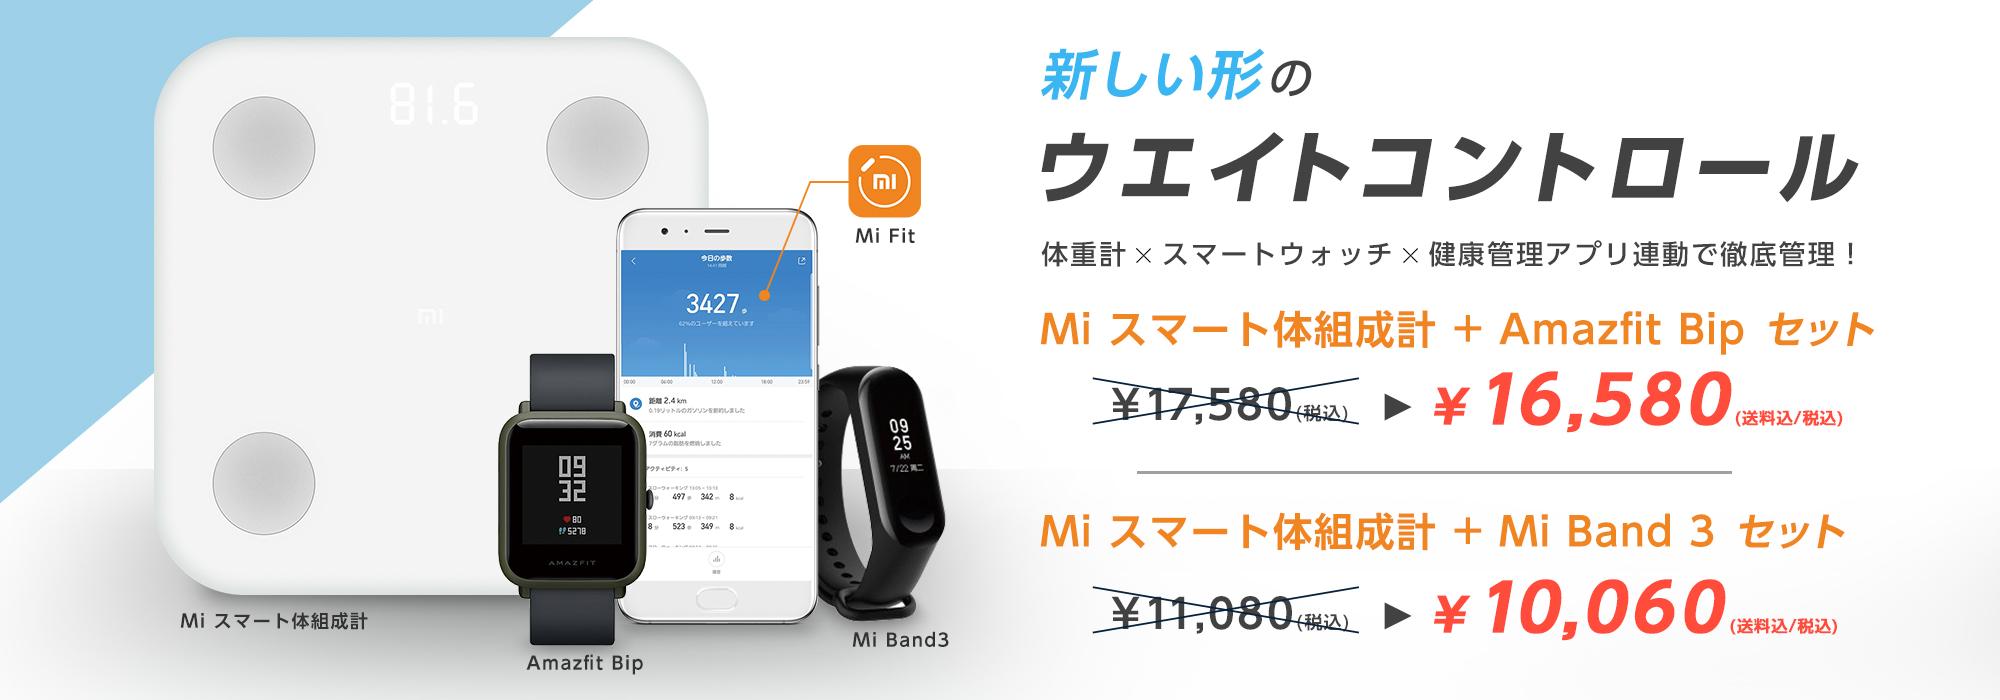 Mi スマート体組成計  Amazfit Bip  mi band3